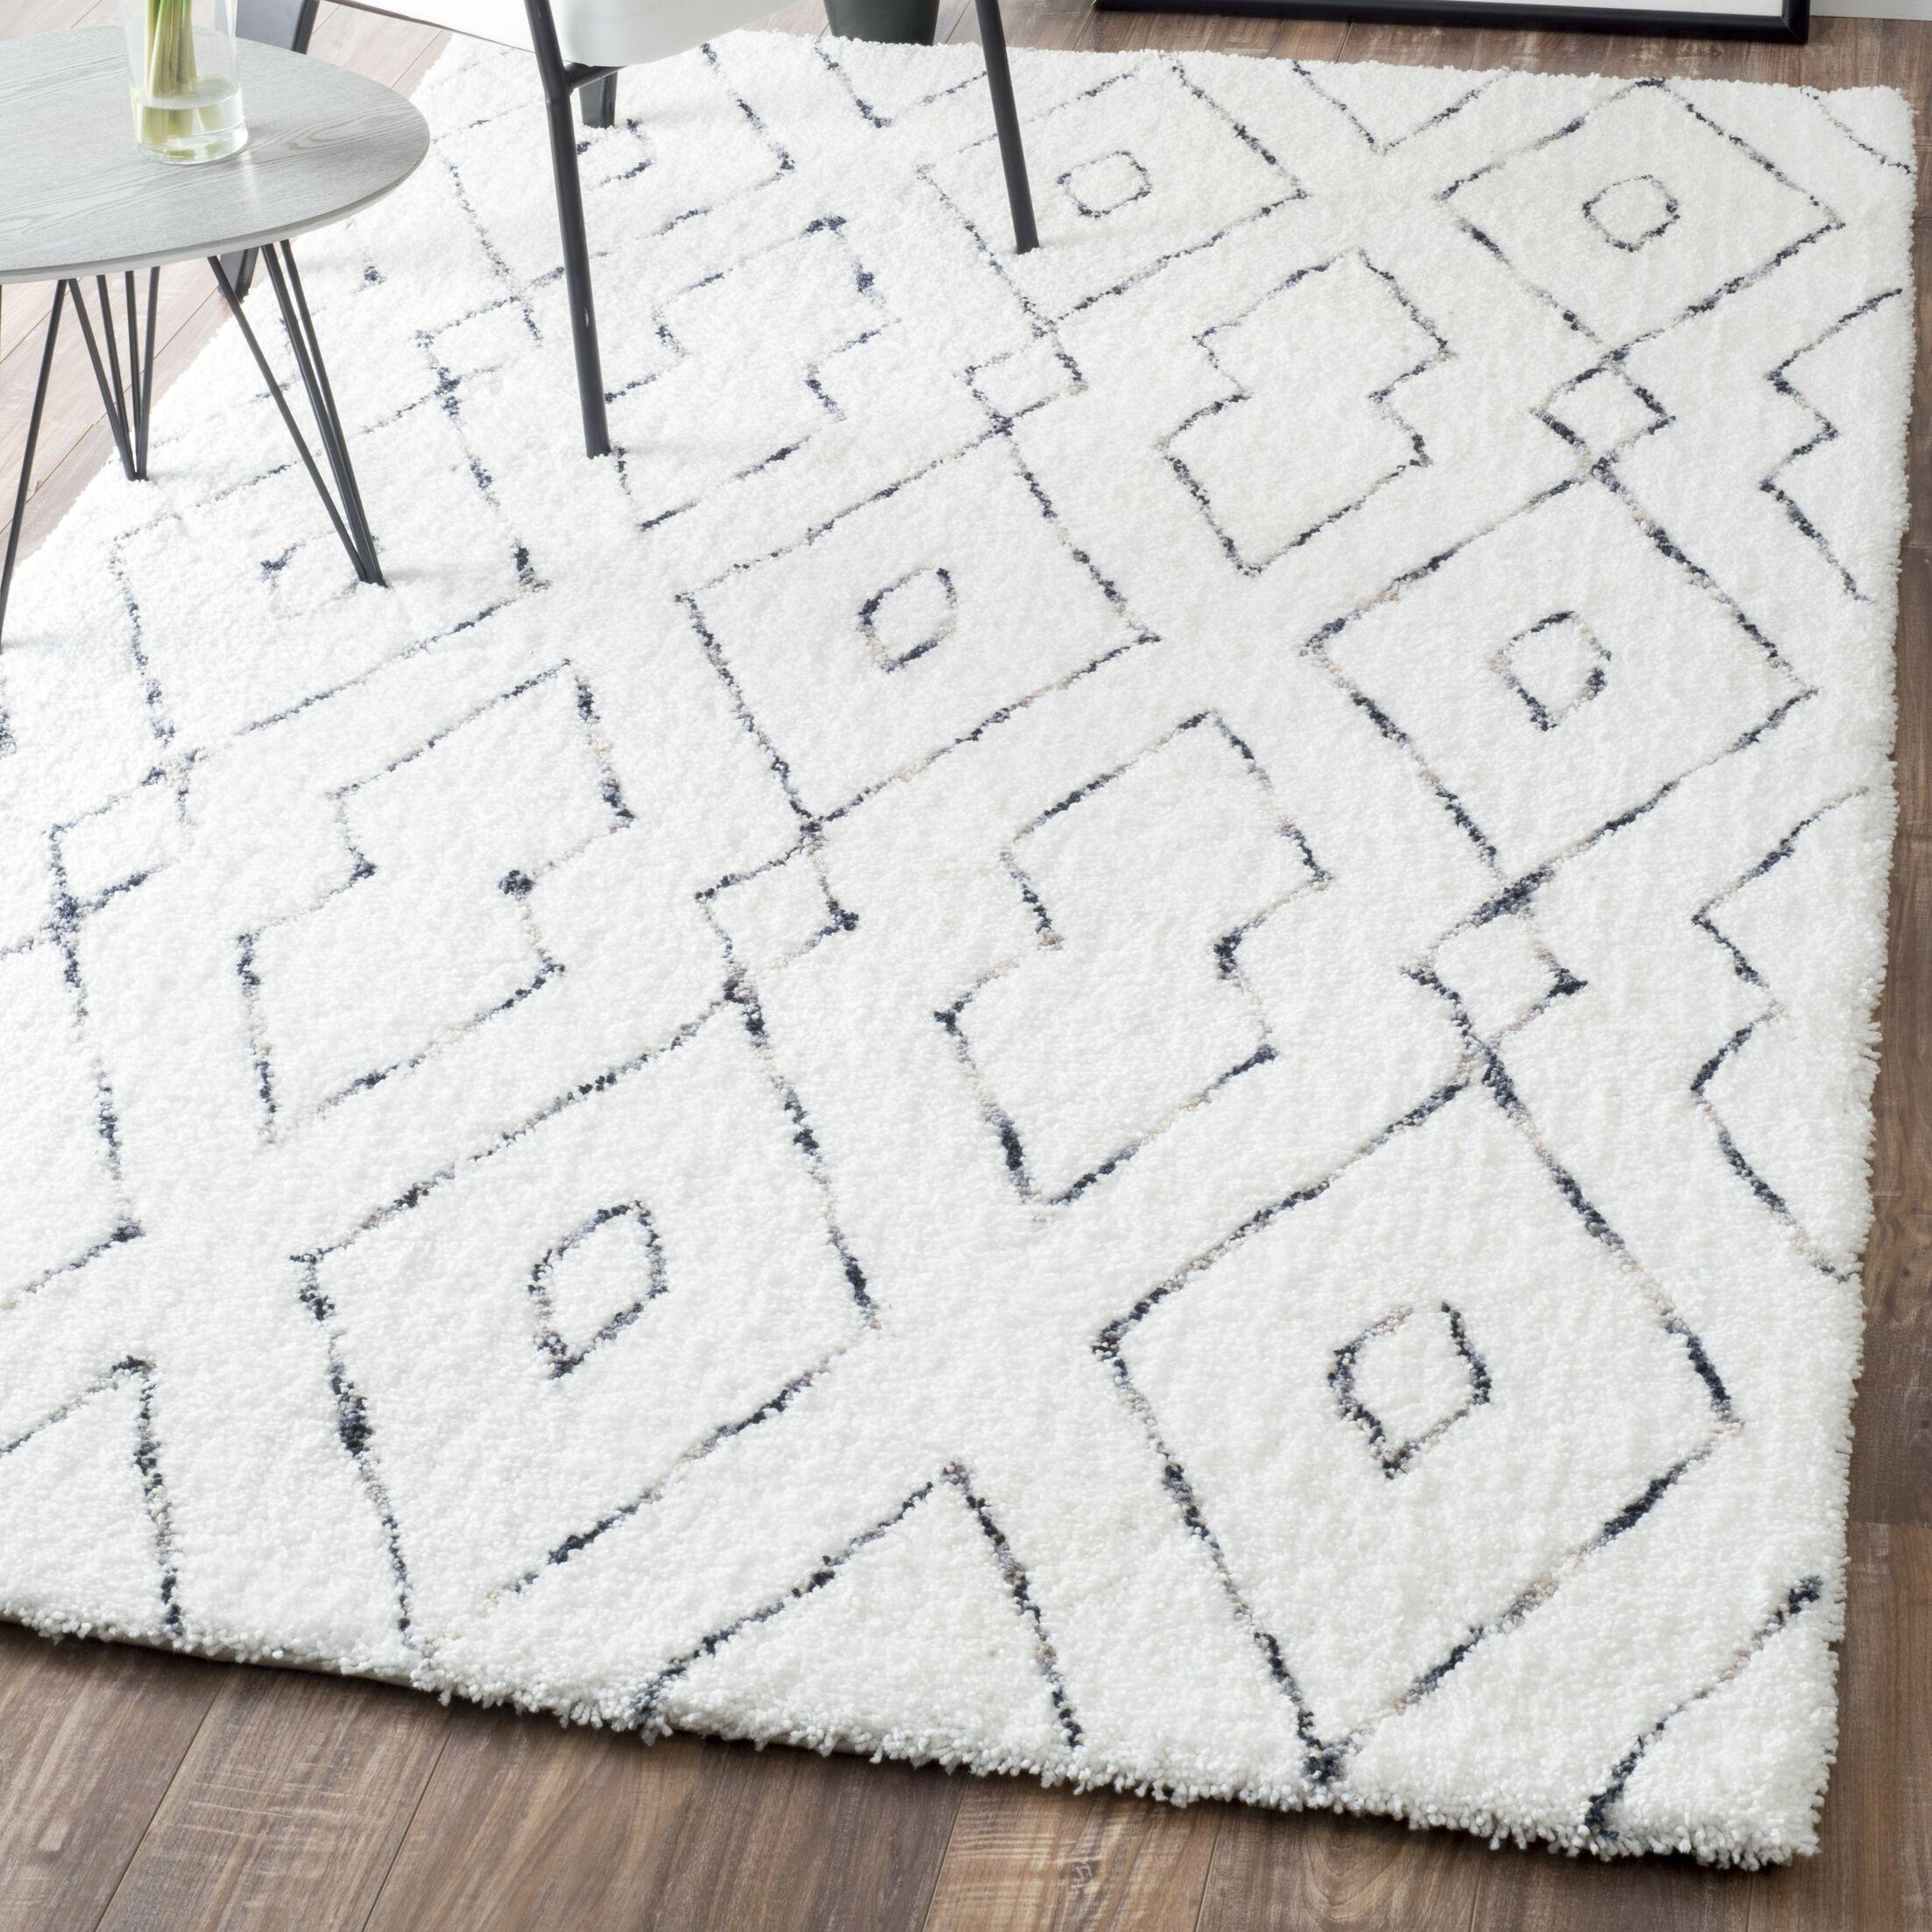 Peraza Hand-Tufted White Area Rug Rug Size: Rectangle 10' x 14'